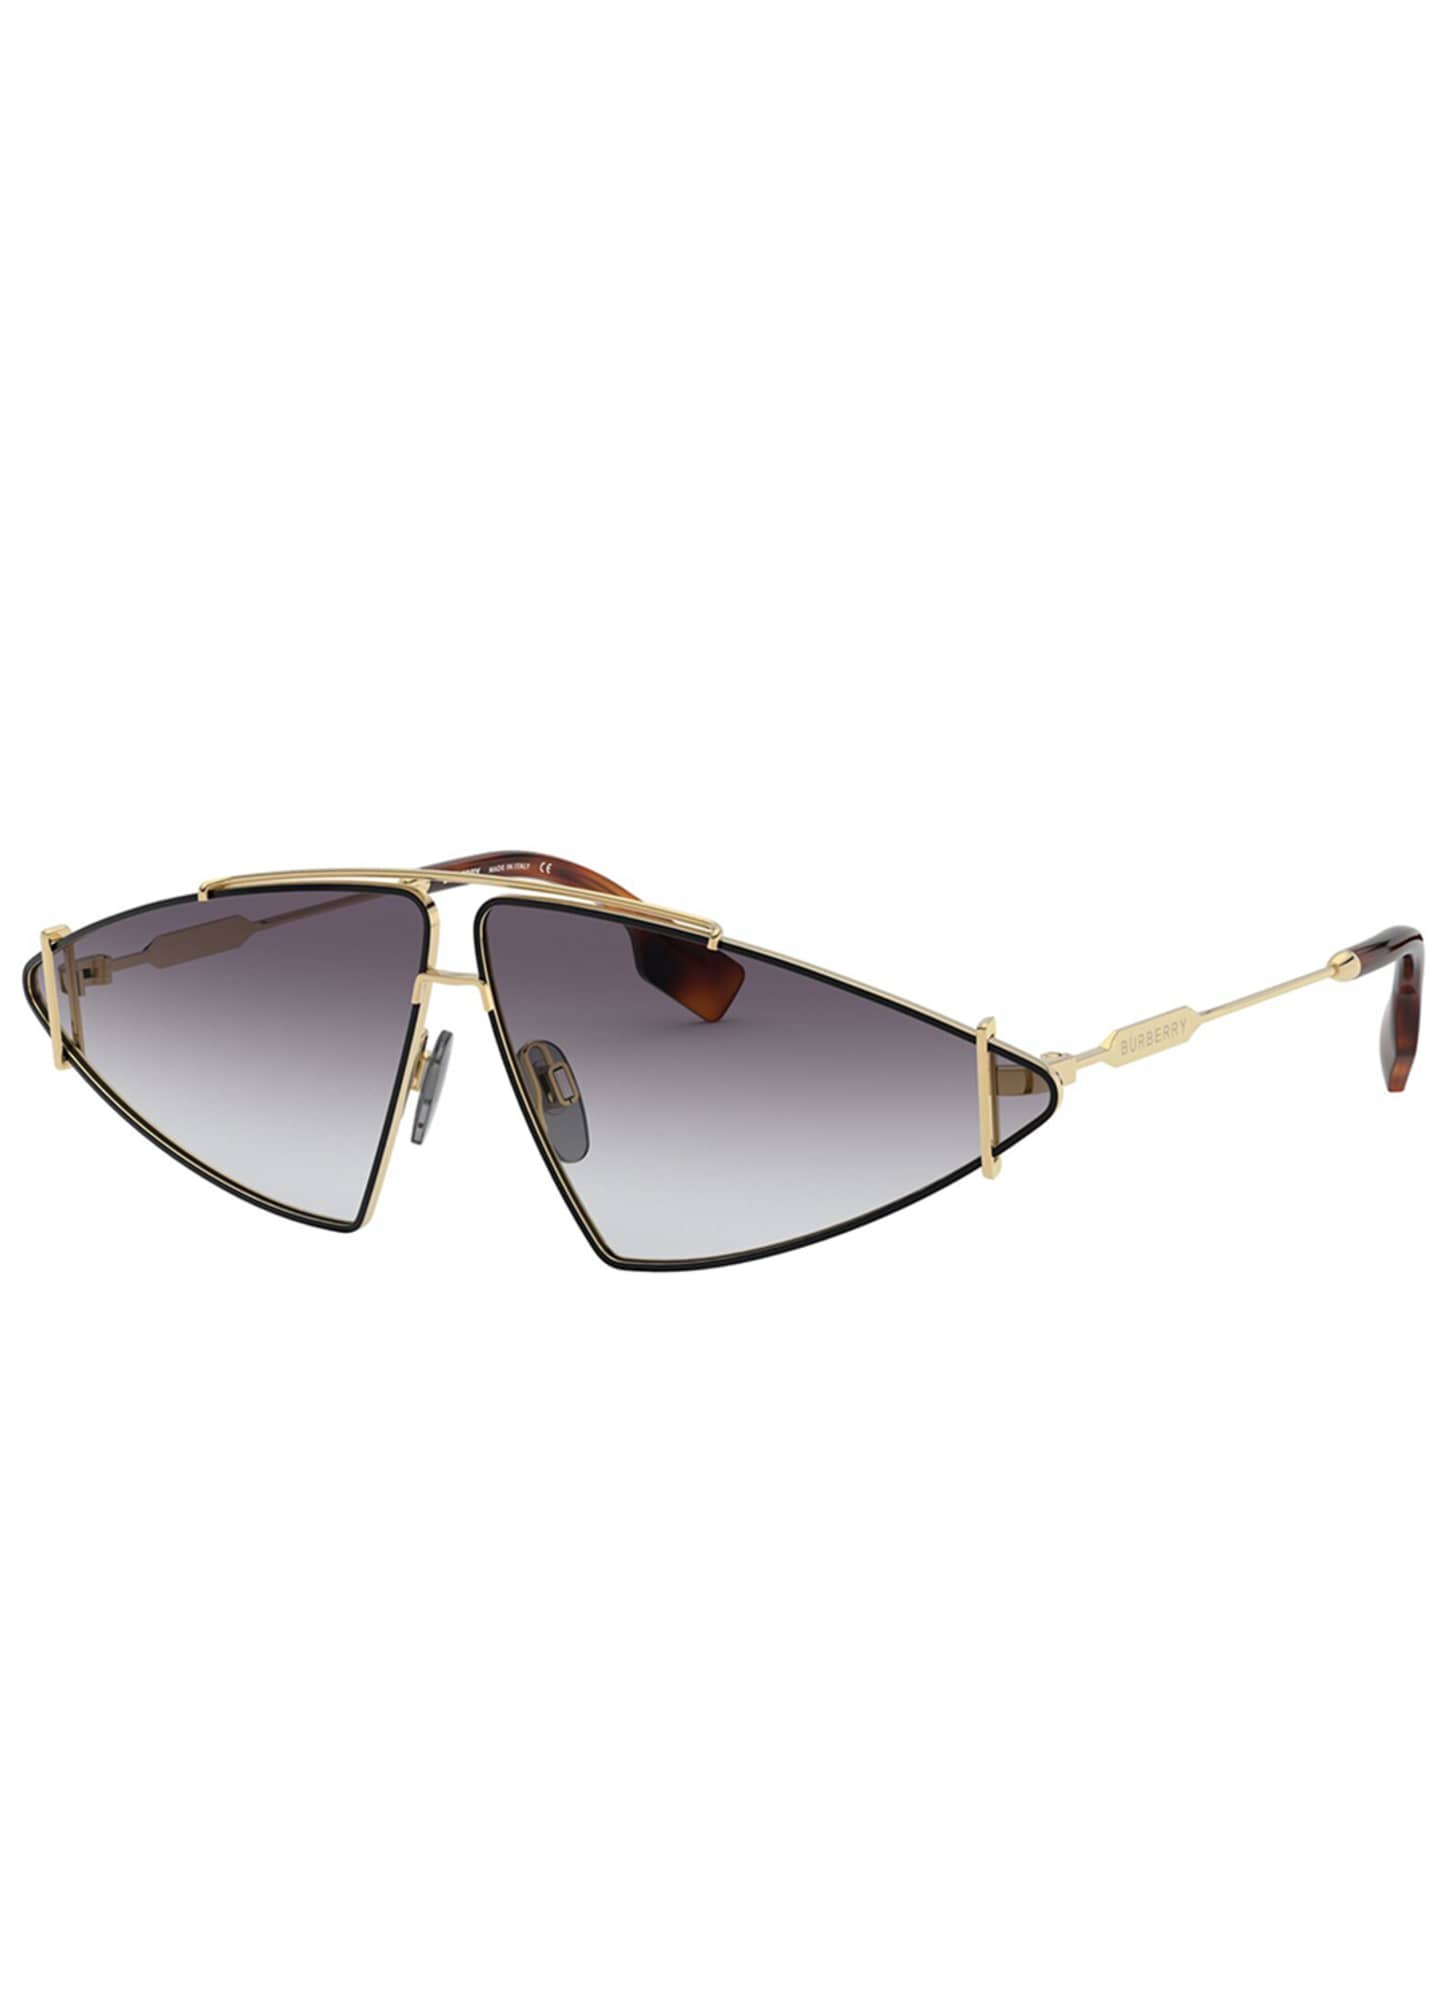 Burberry Metal Triangle Shield Sunglasses